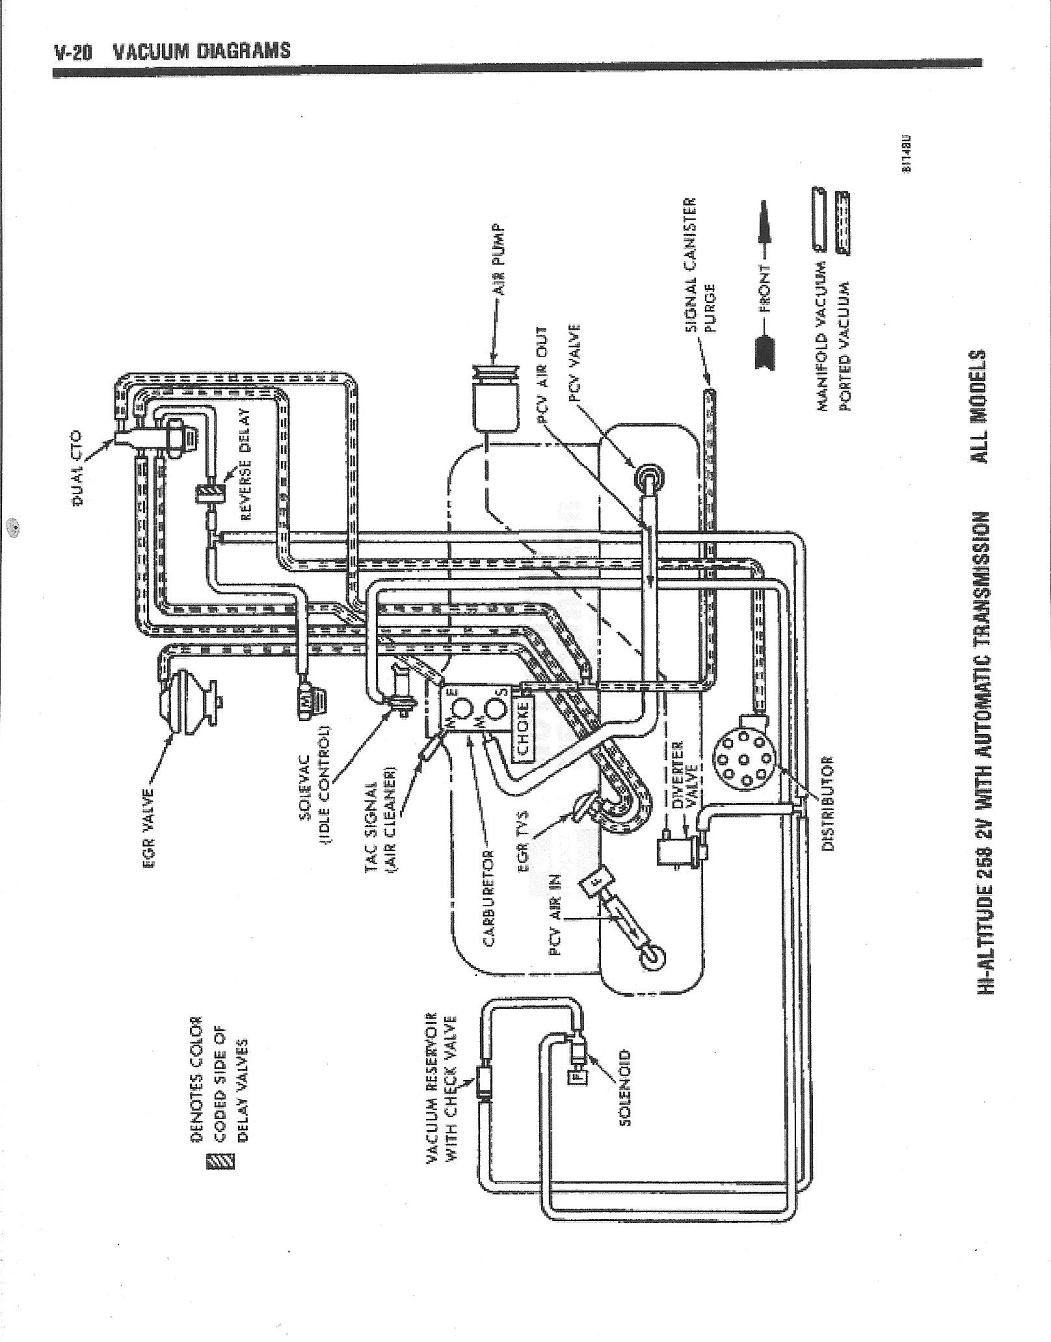 81-vacuum-layout002.jpg